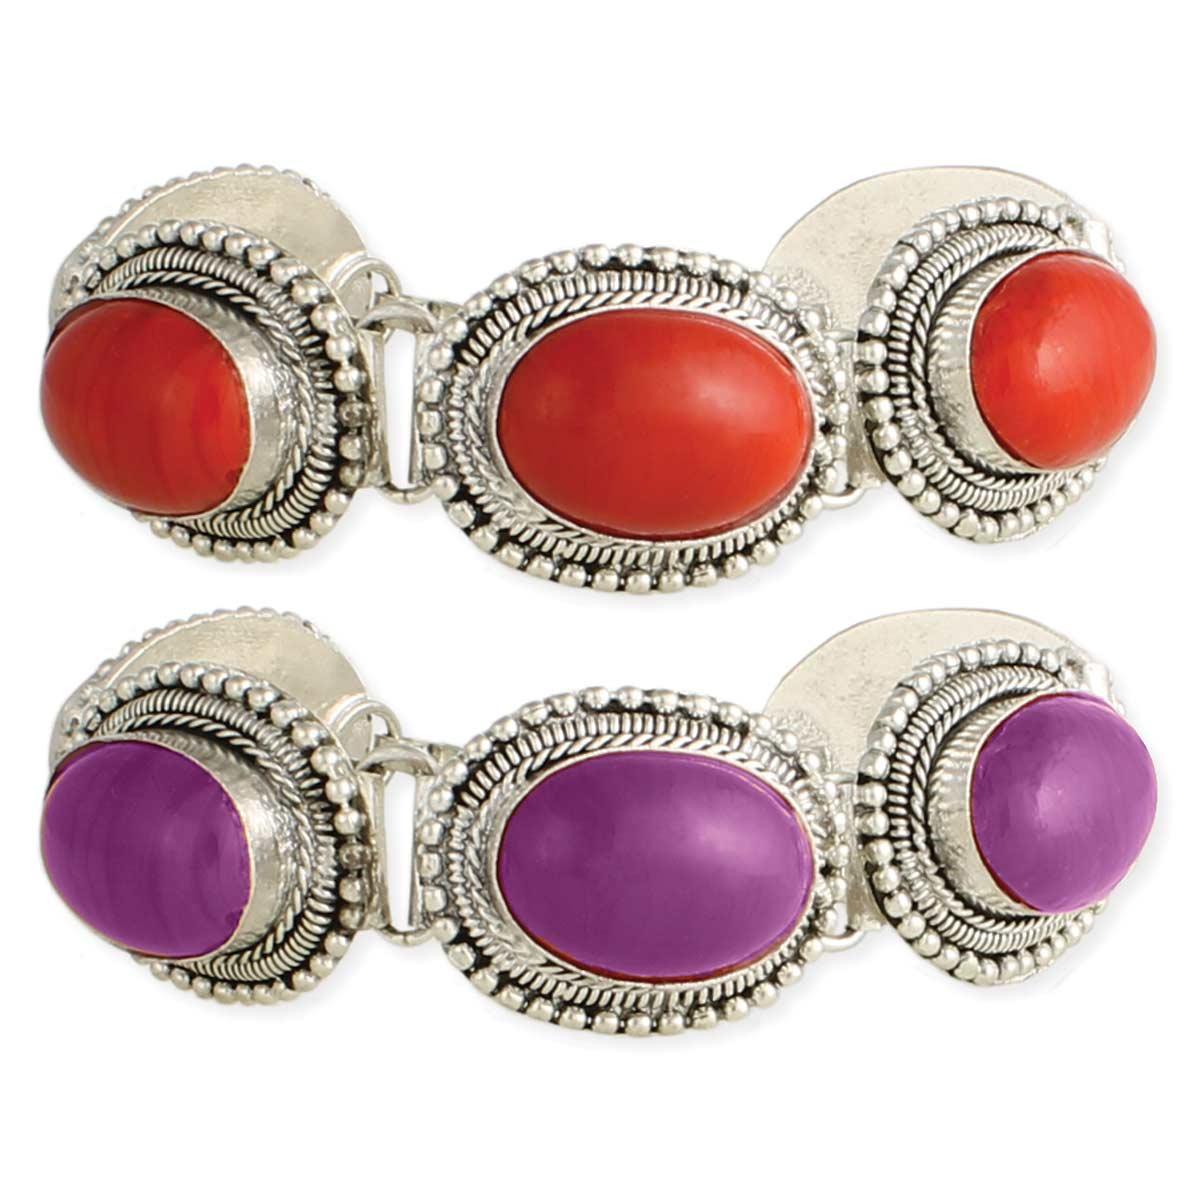 Silver & Oval Bead Bracelets